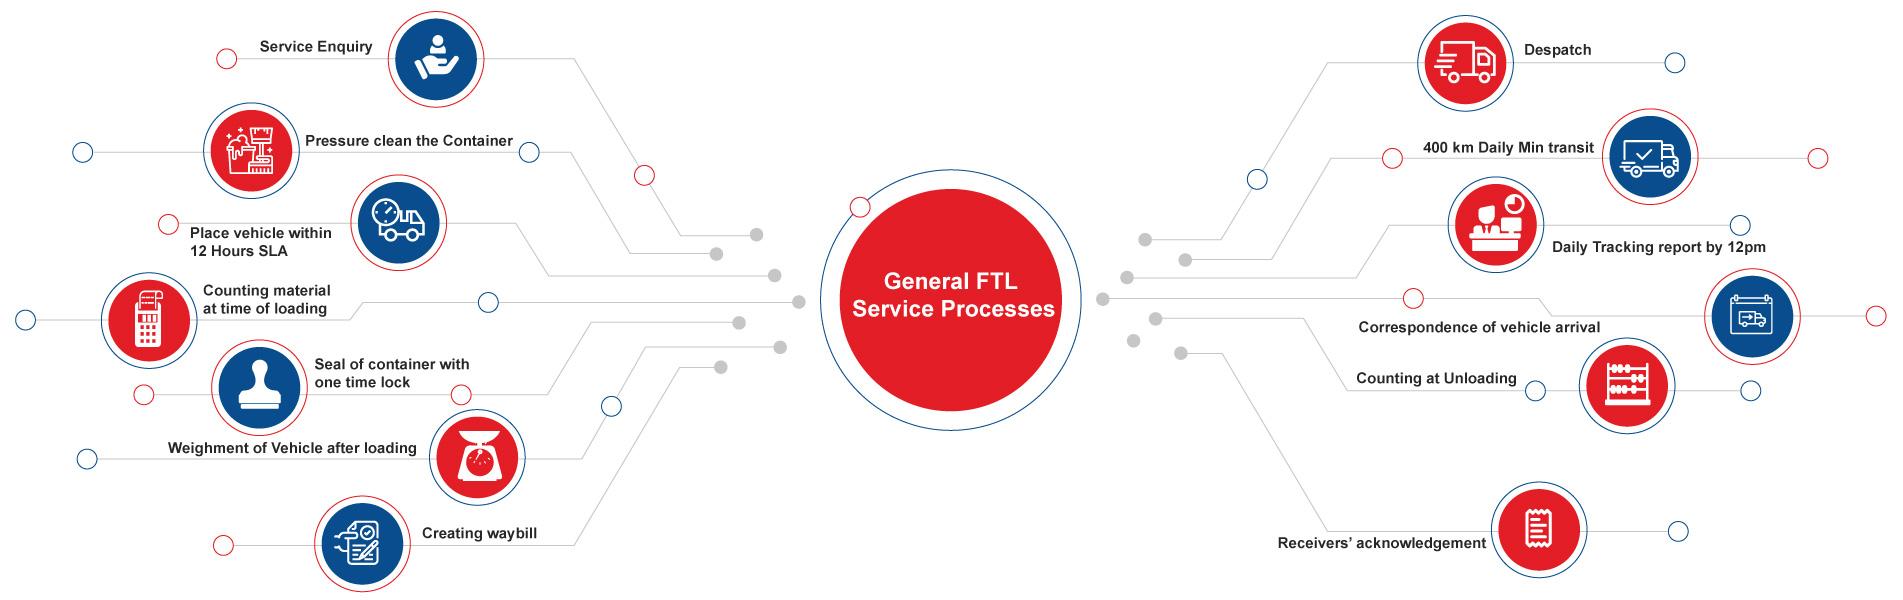 general-ftl-service